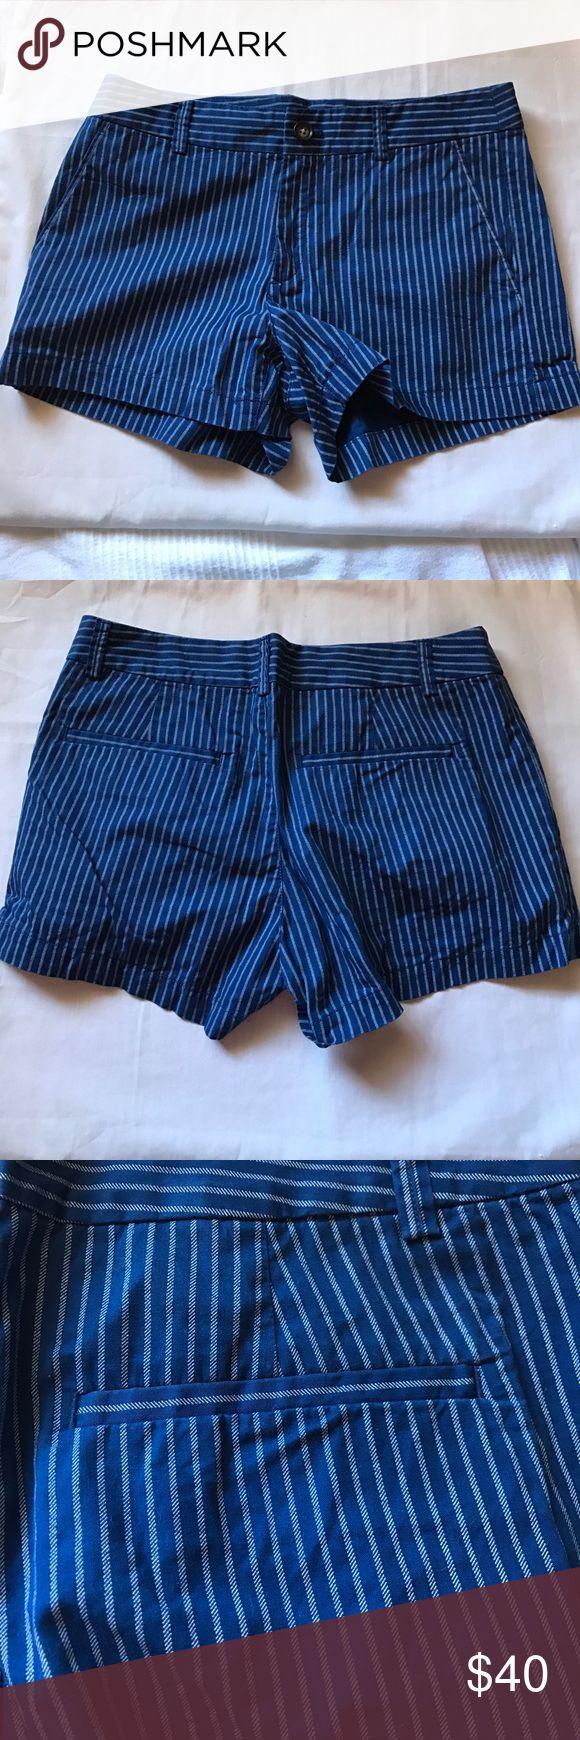 UNIQLO Blue Striped Shorts [UNIQLO Blue Striped Shorts] 100% cotton. Worn once. In Excellent Used Condition. Uniqlo Shorts